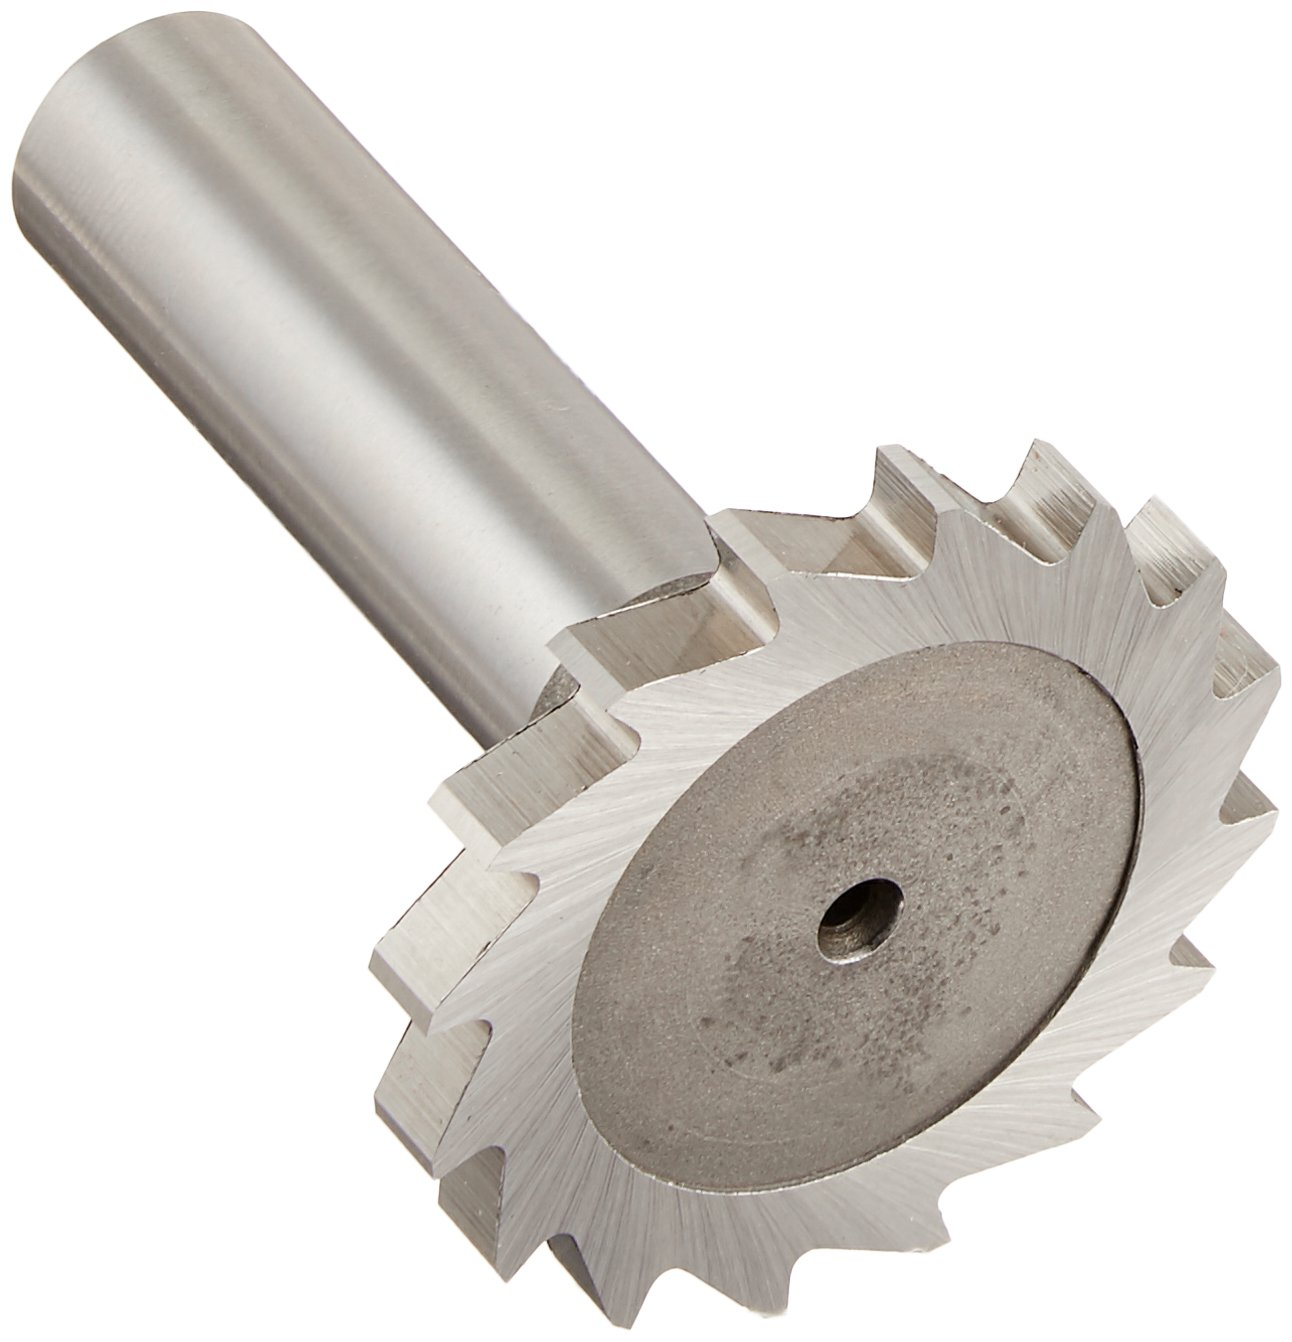 KEO 69311 High-Speed Steel Narrow Width Keyseat Cutter, Uncoated (Bright) Finish, Round Shank, 1/2'' Shank Diameter, 1-1/2'' Cutter Diameter, 16 Straight Teeth, 11/64'' Face Width